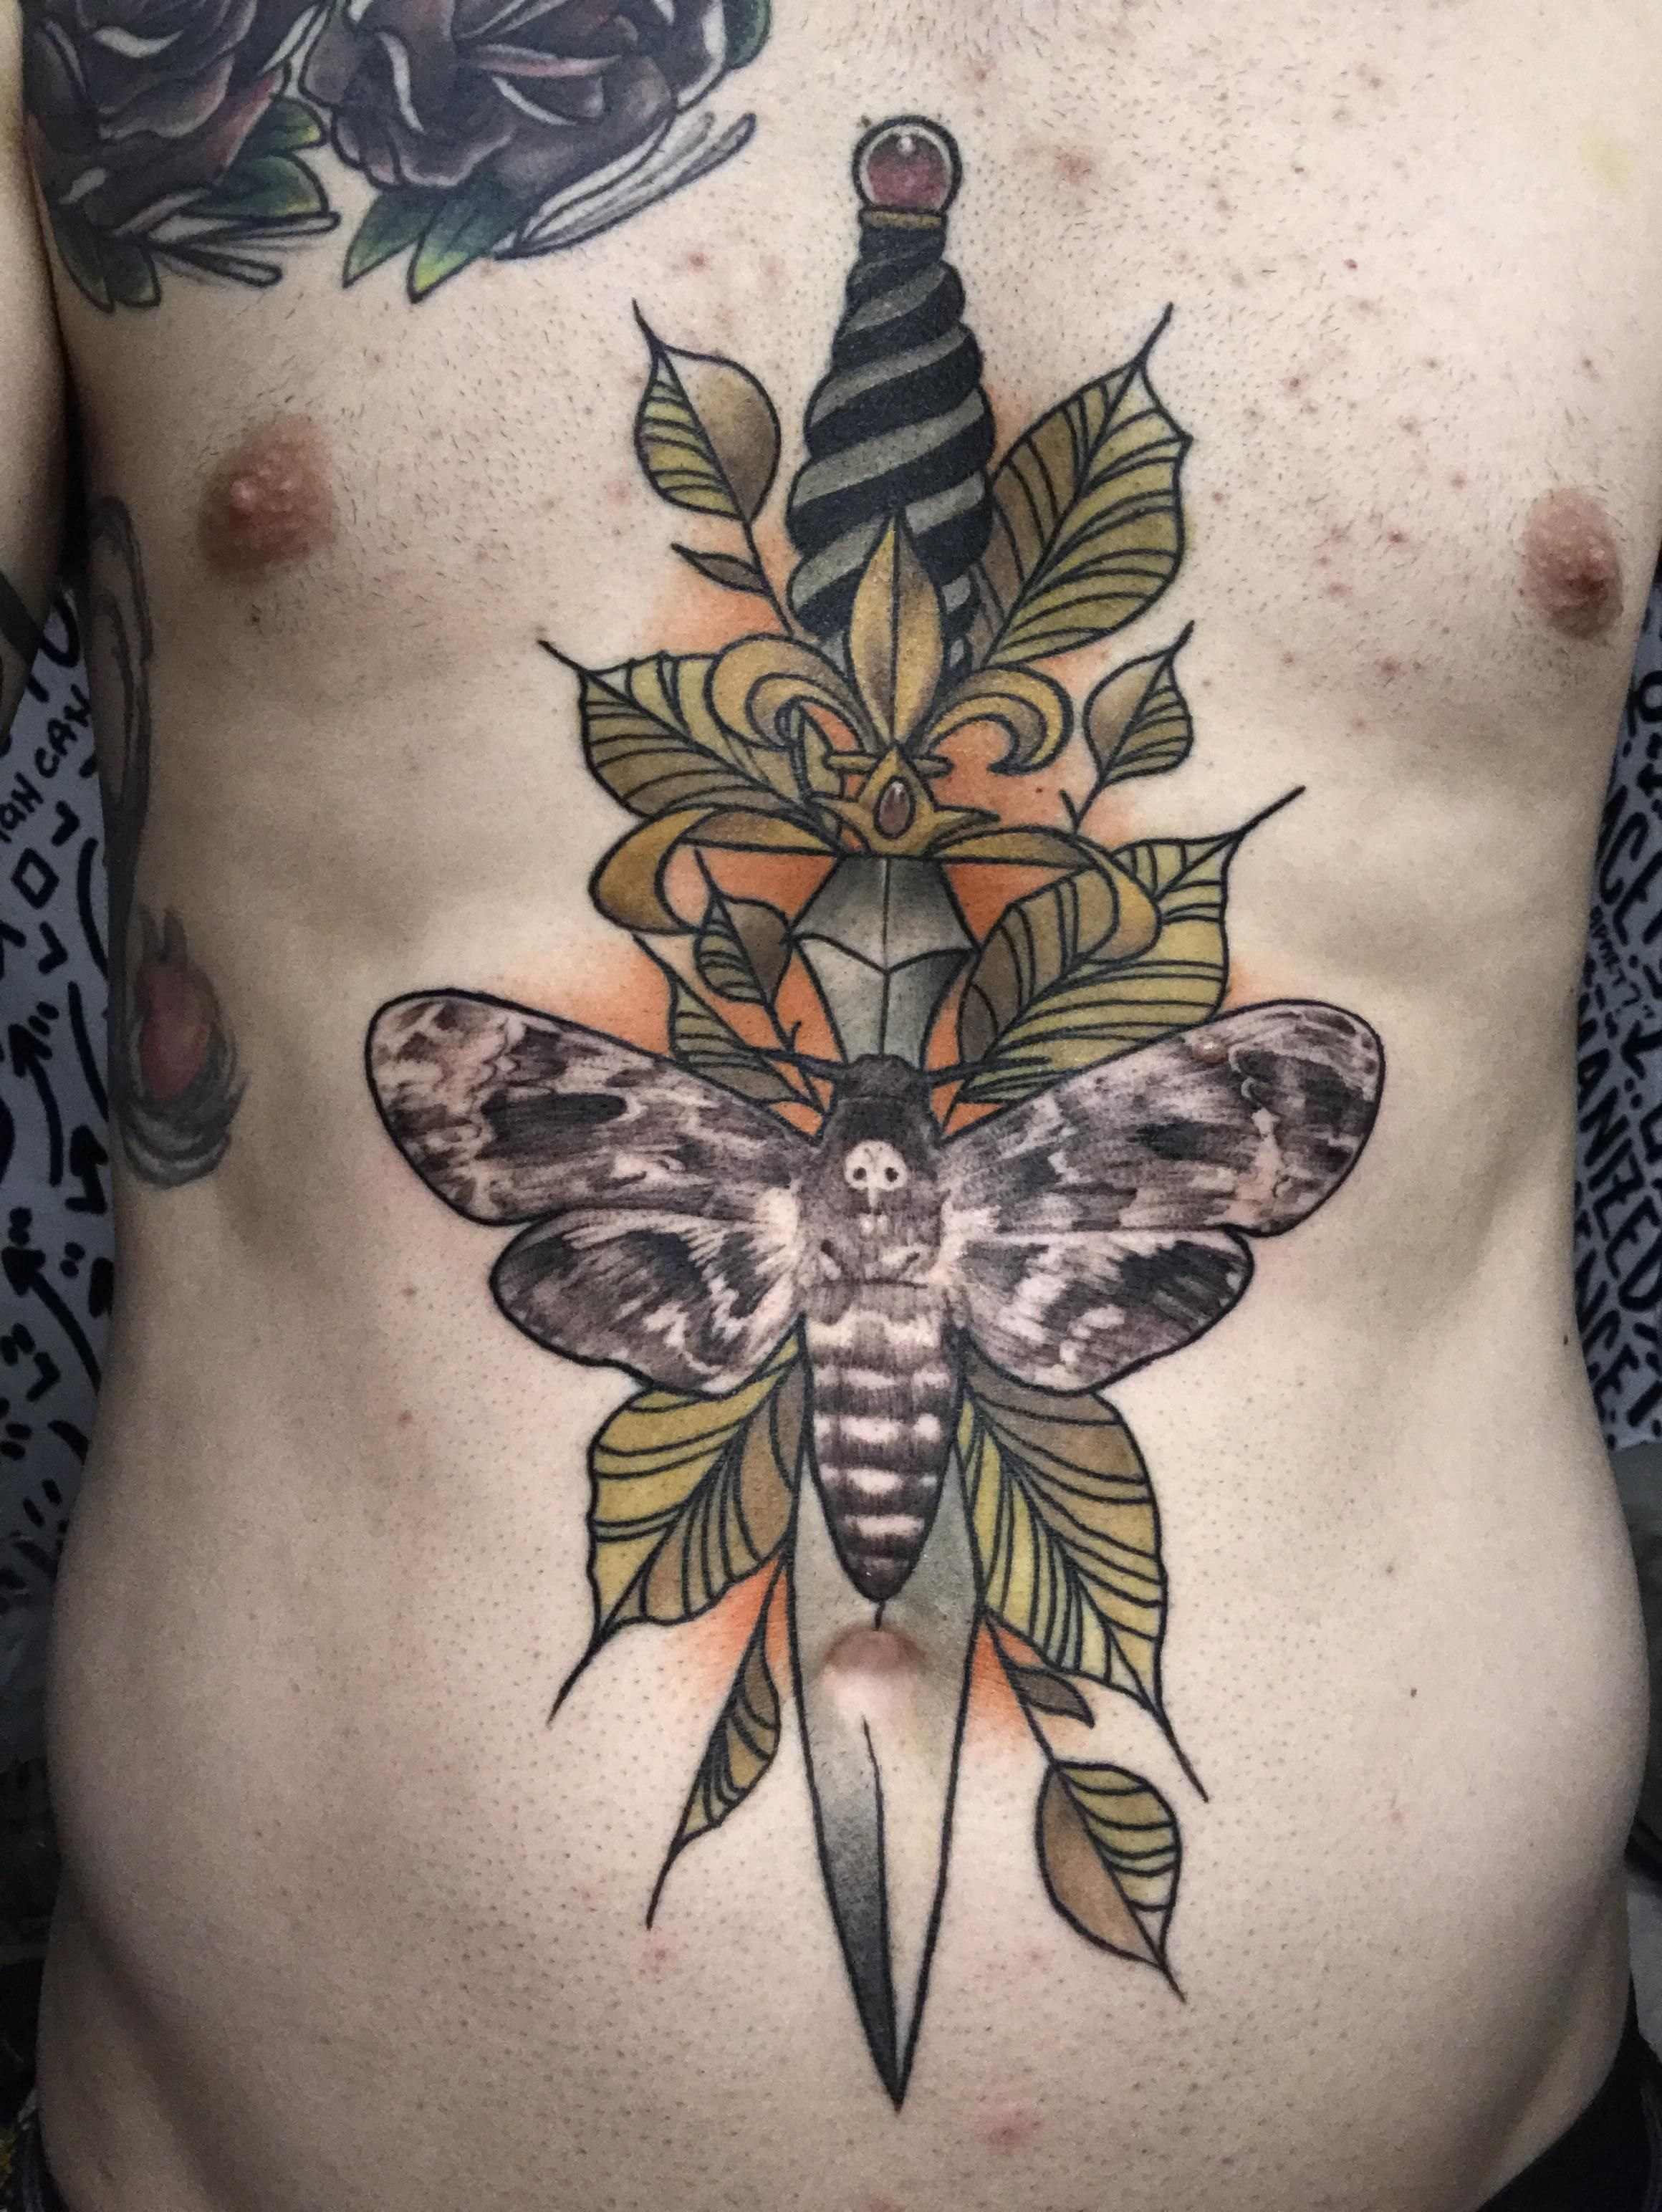 Electric chair tattoo - Deaths Head Moth By Keith Smith Electric Chair Tattoo Flint Mi